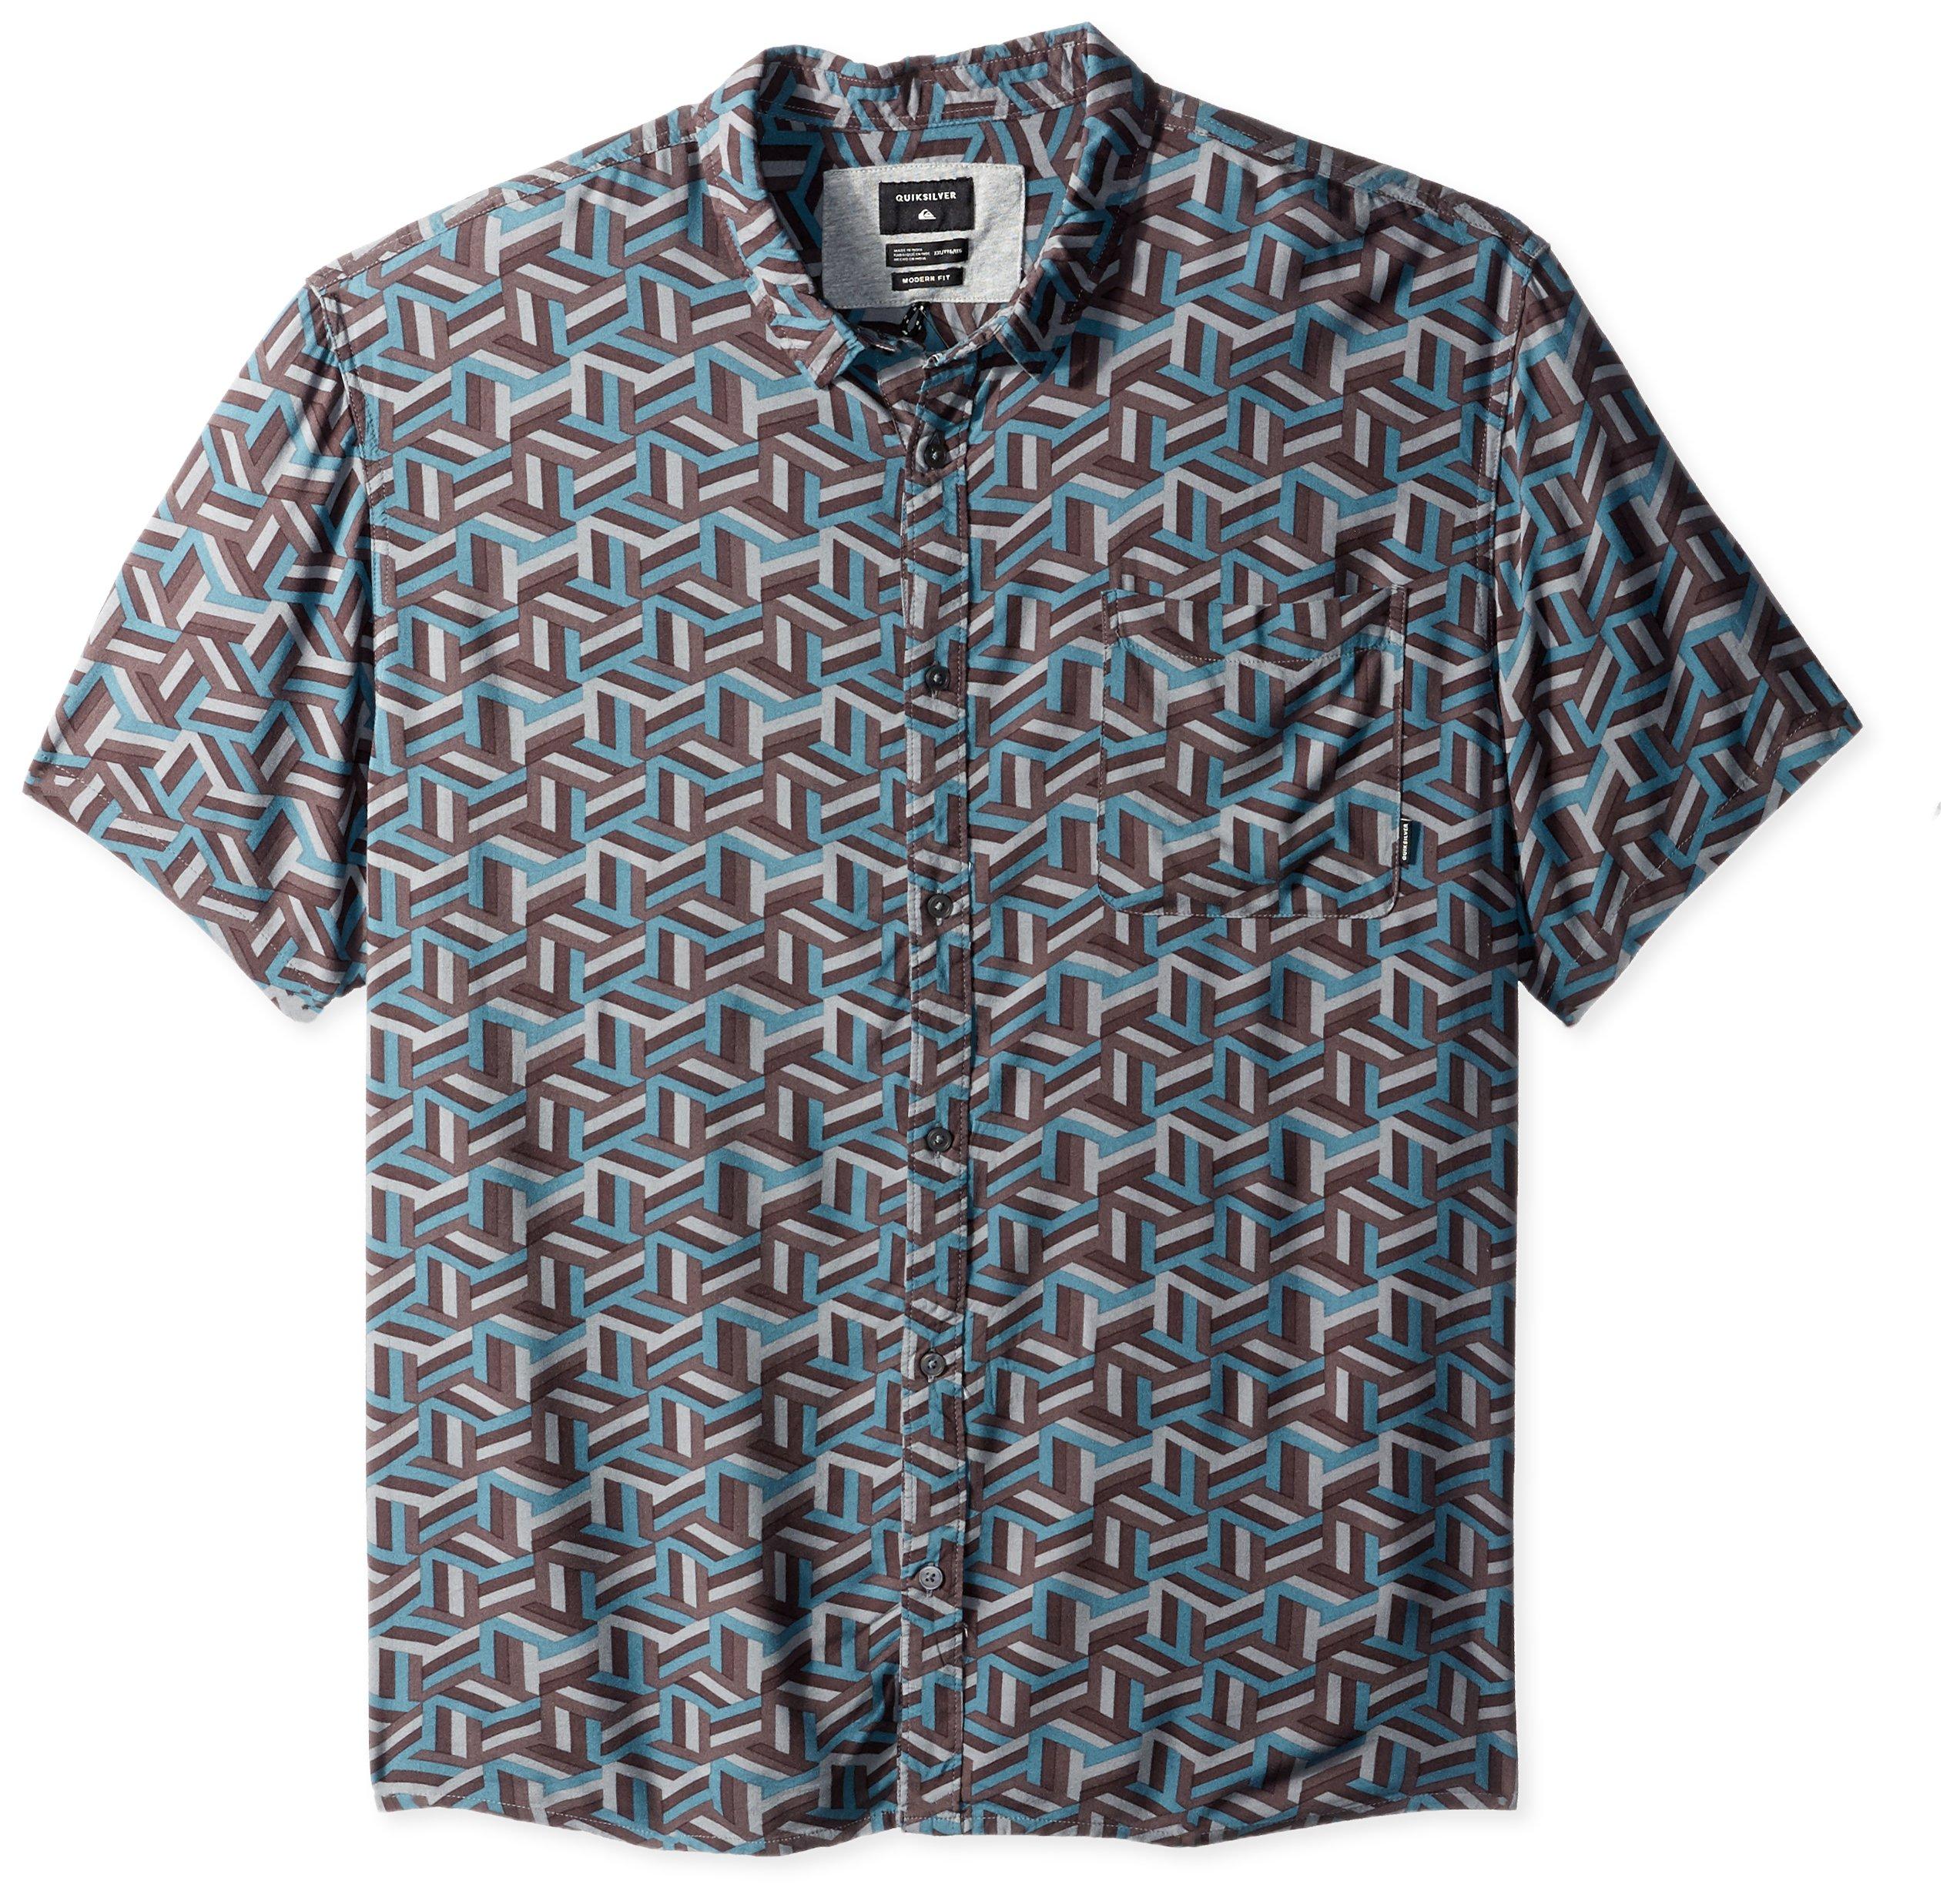 Quiksilver Men's Variable Shirt, Tapestry Chiba Variable, XL